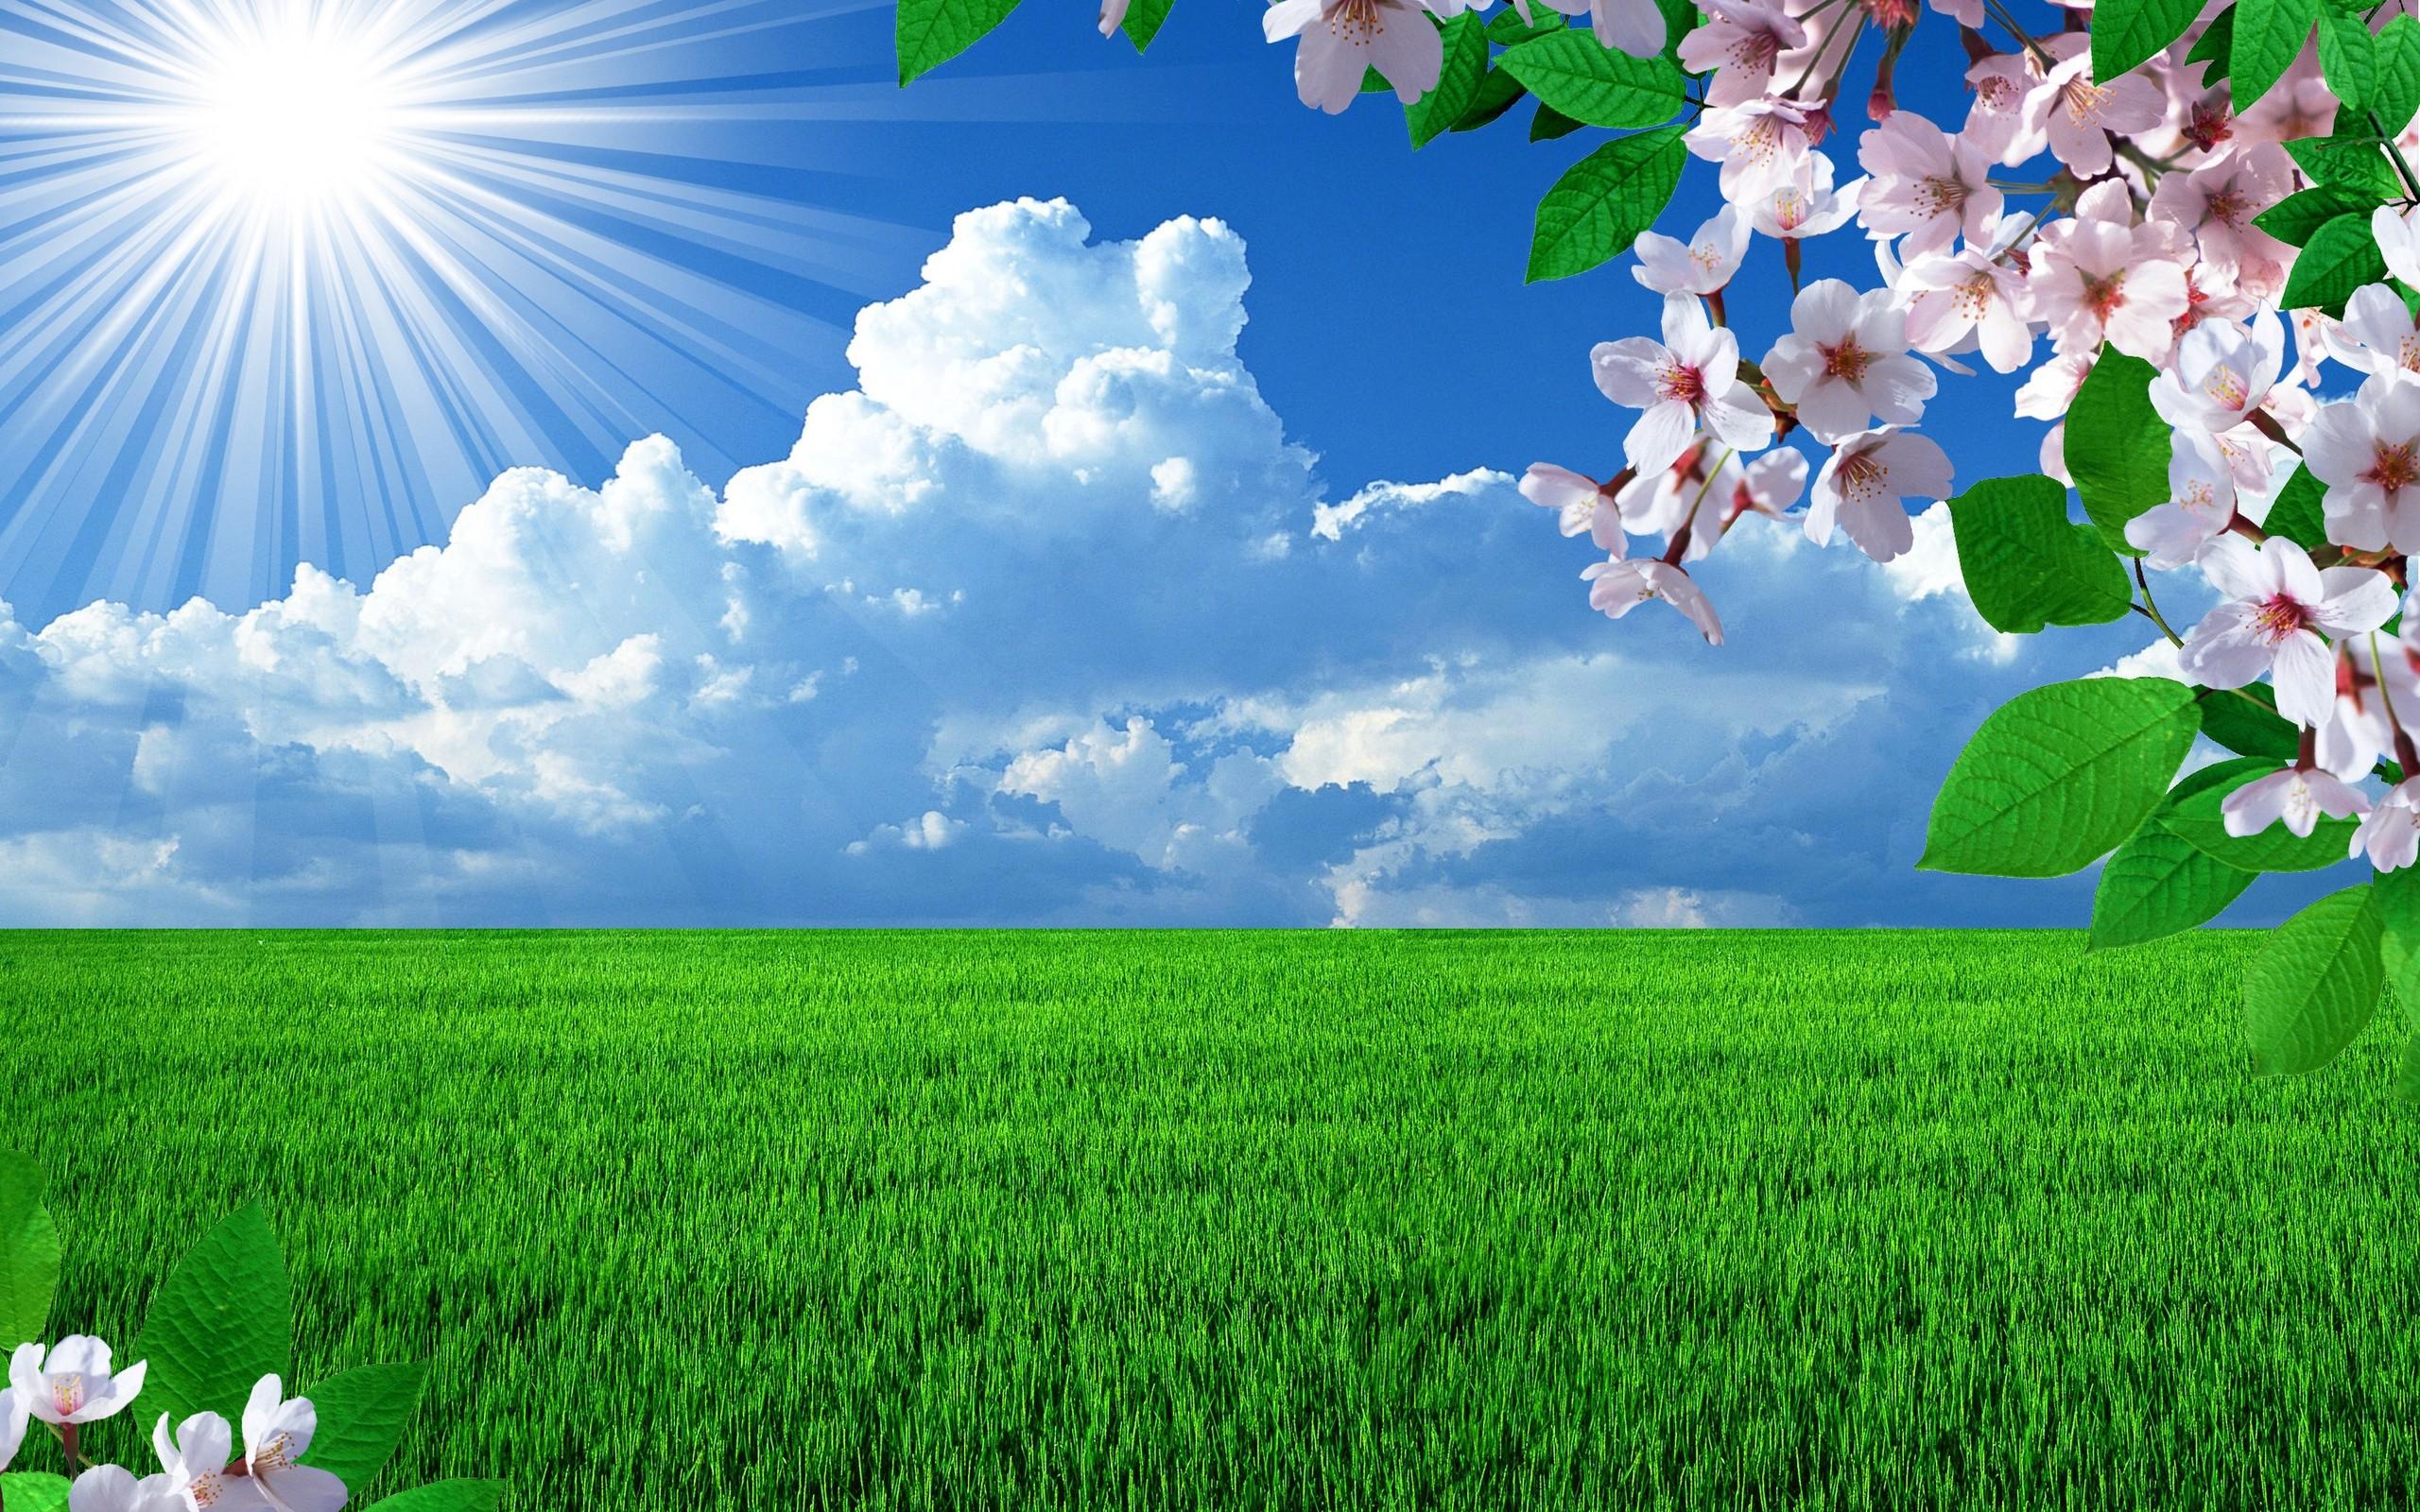 Grassy field with sun